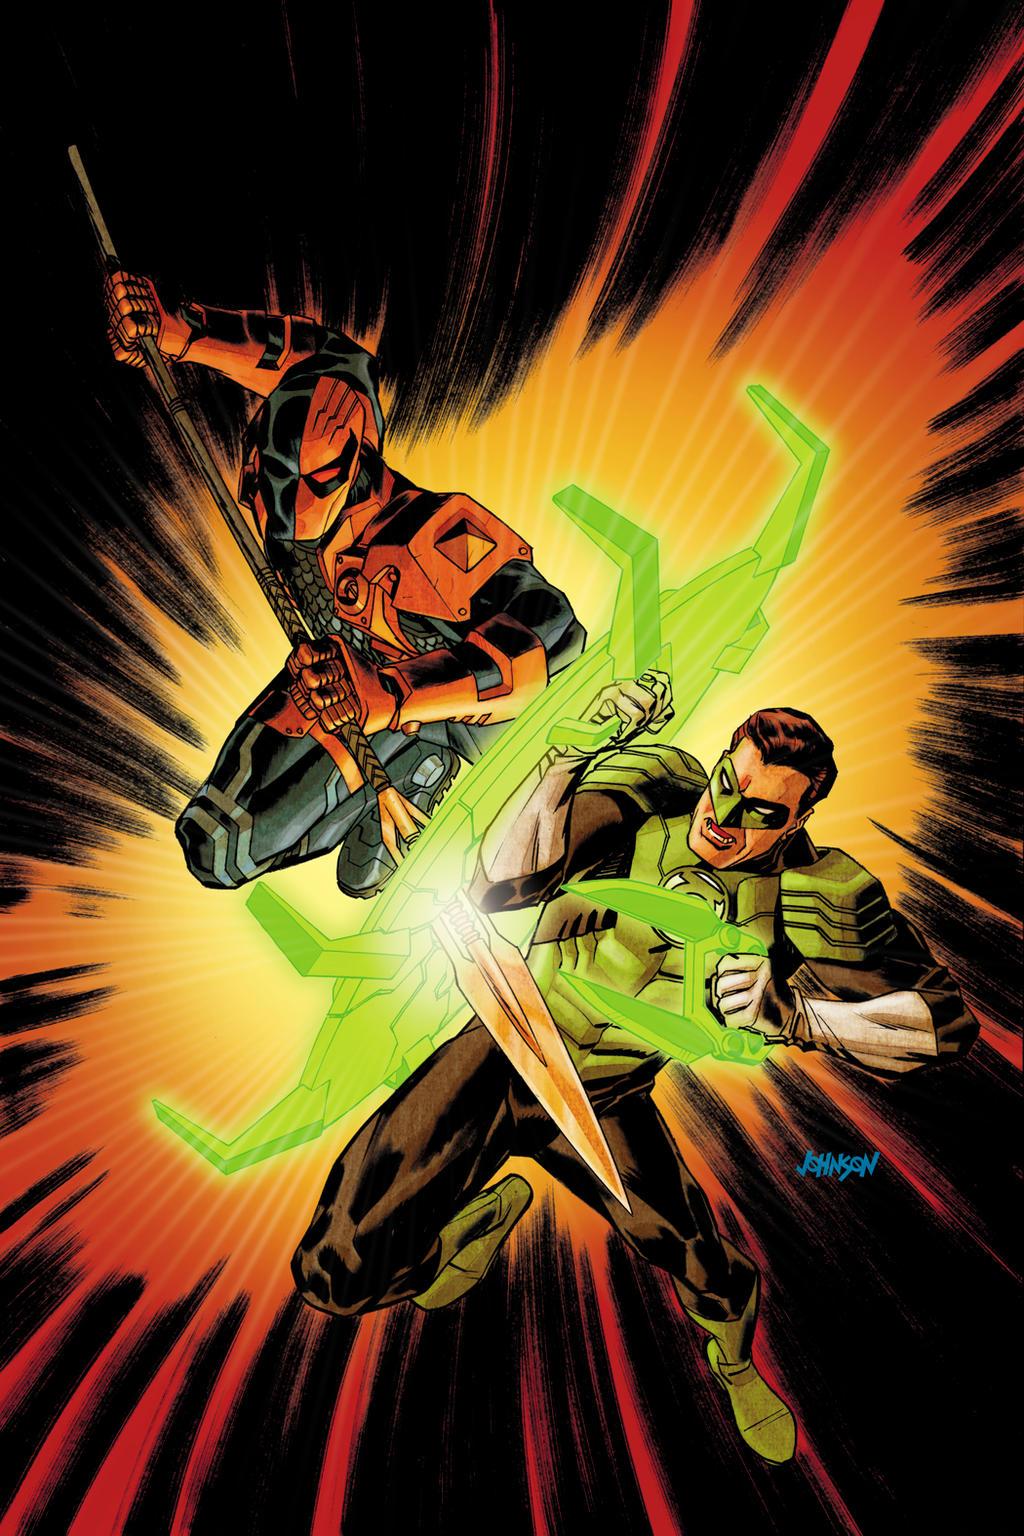 Deathstroke VS Green Lantern by Devilpig on DeviantArt | 1024 x 1536 jpeg 462kB